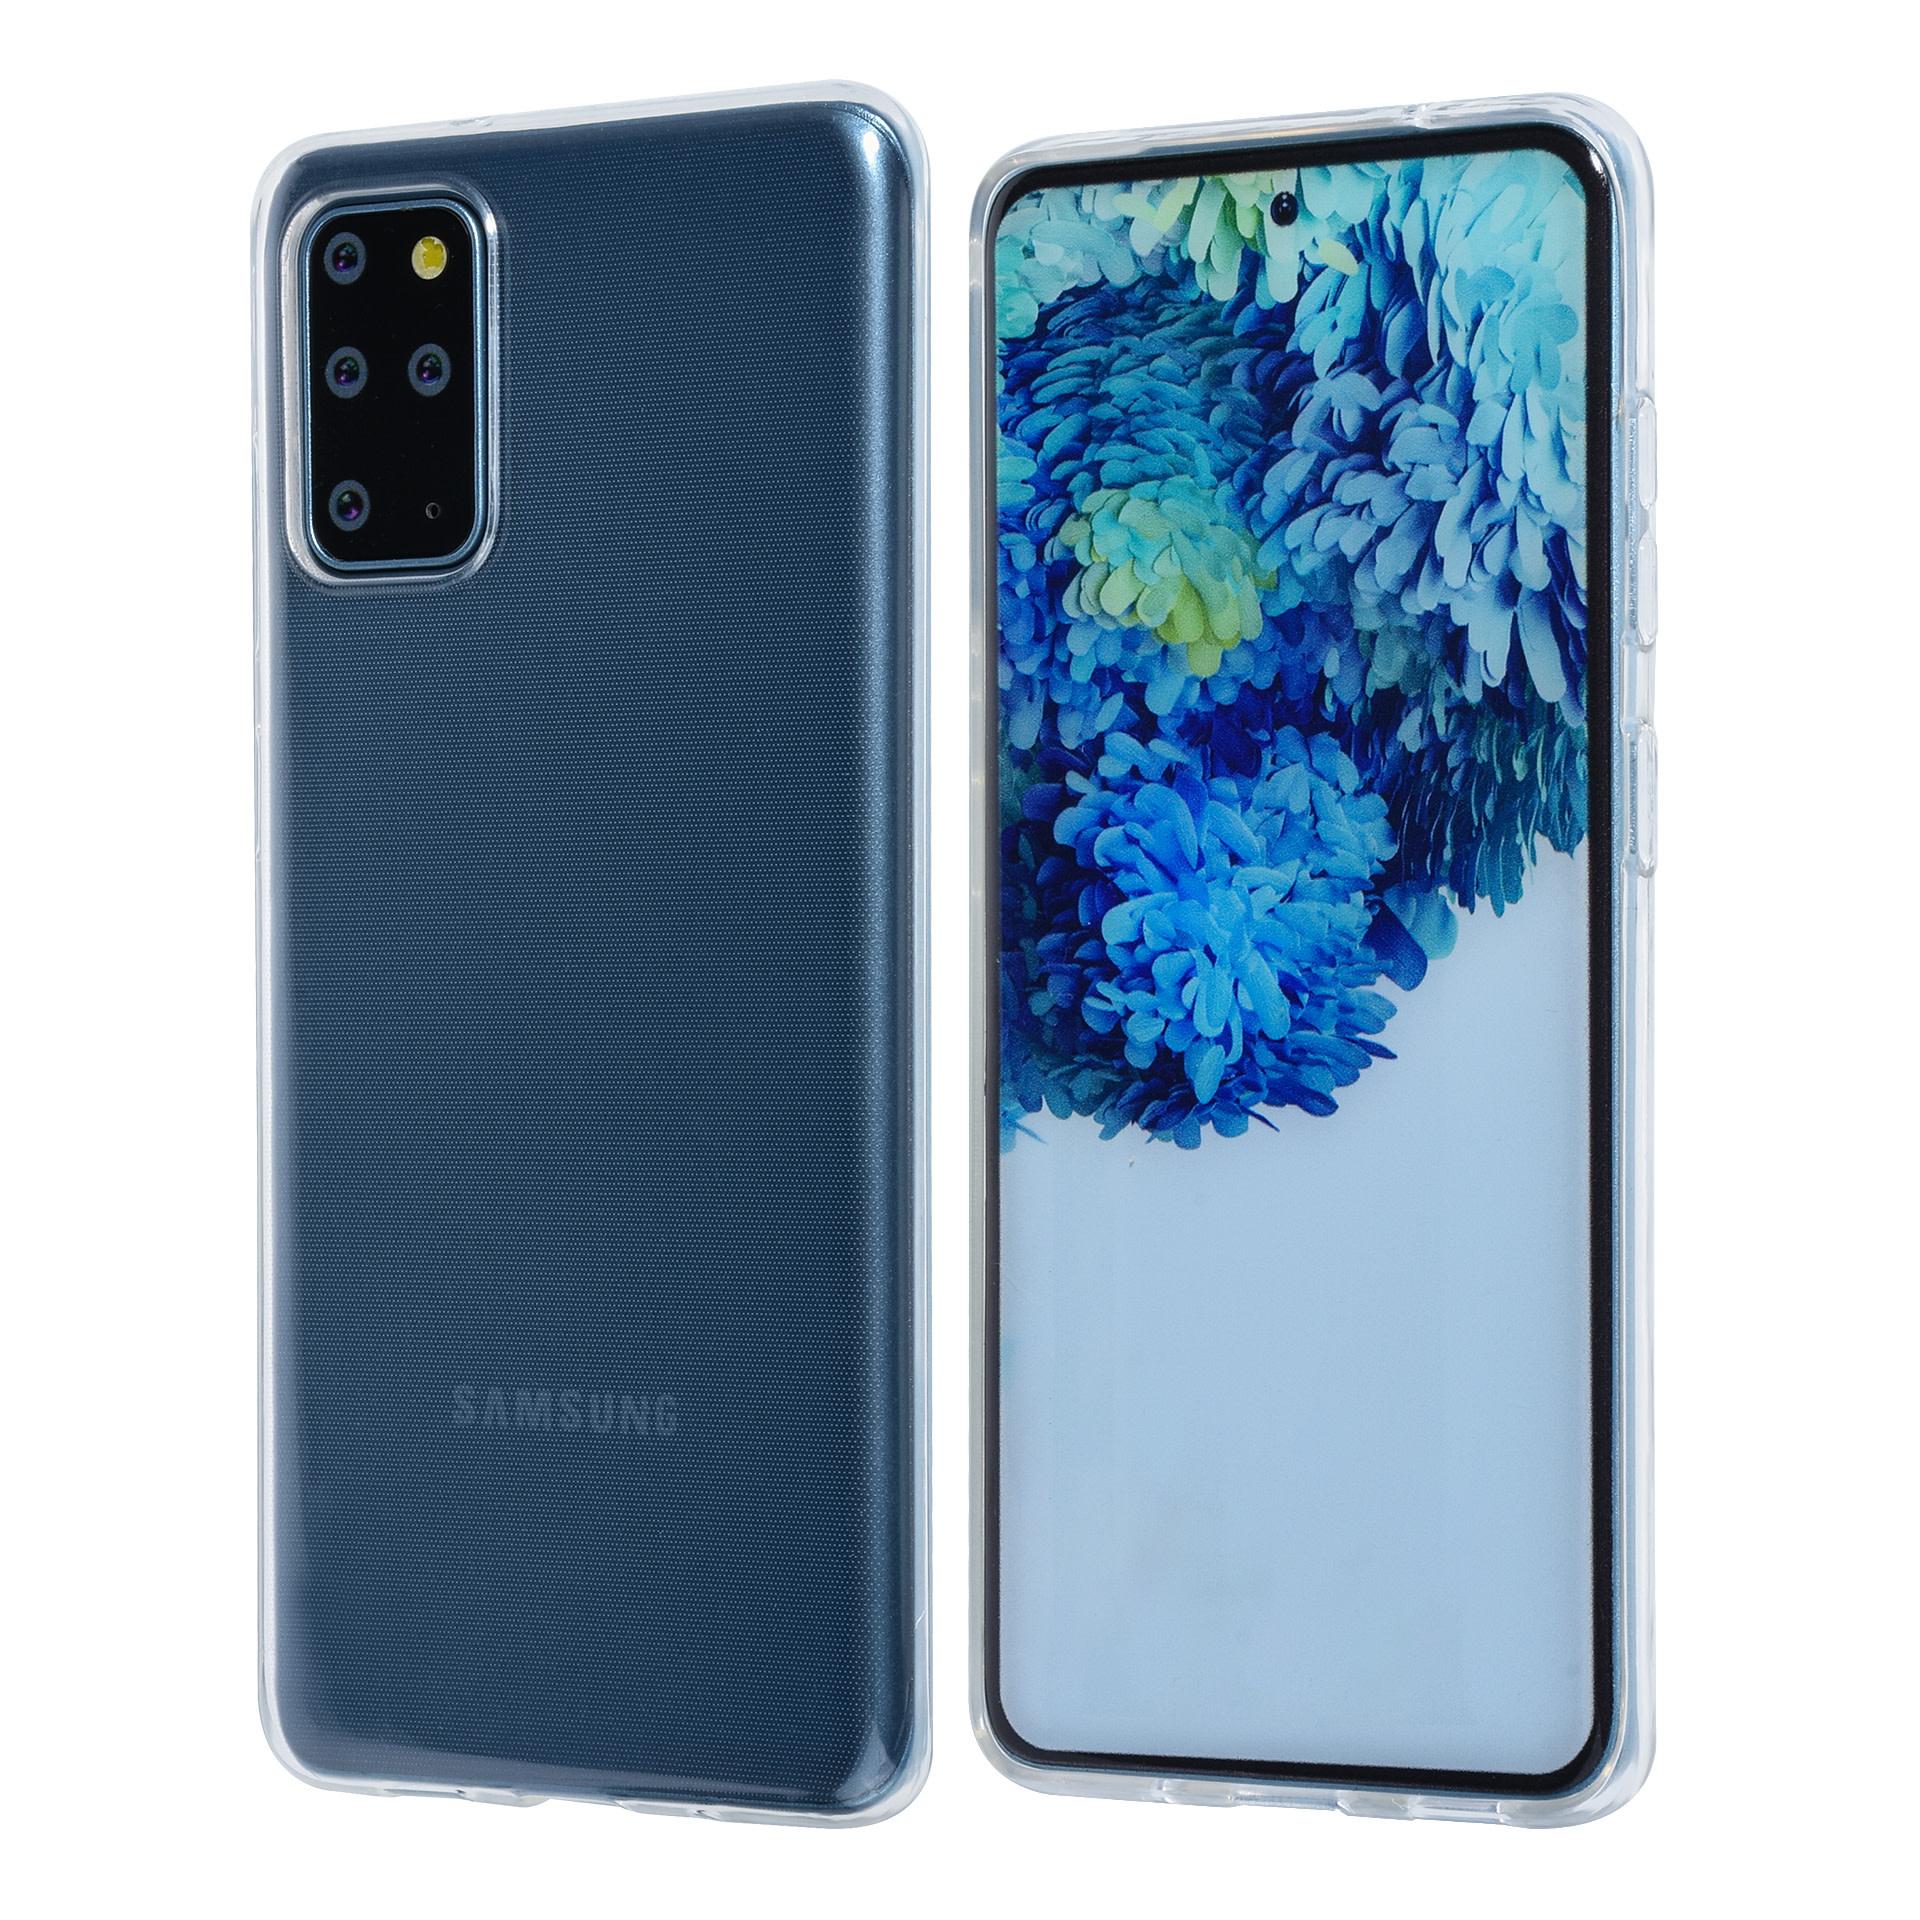 Samsung Galaxy S20 Plus Transparent Back-Cover hul - Sanfte Berührung